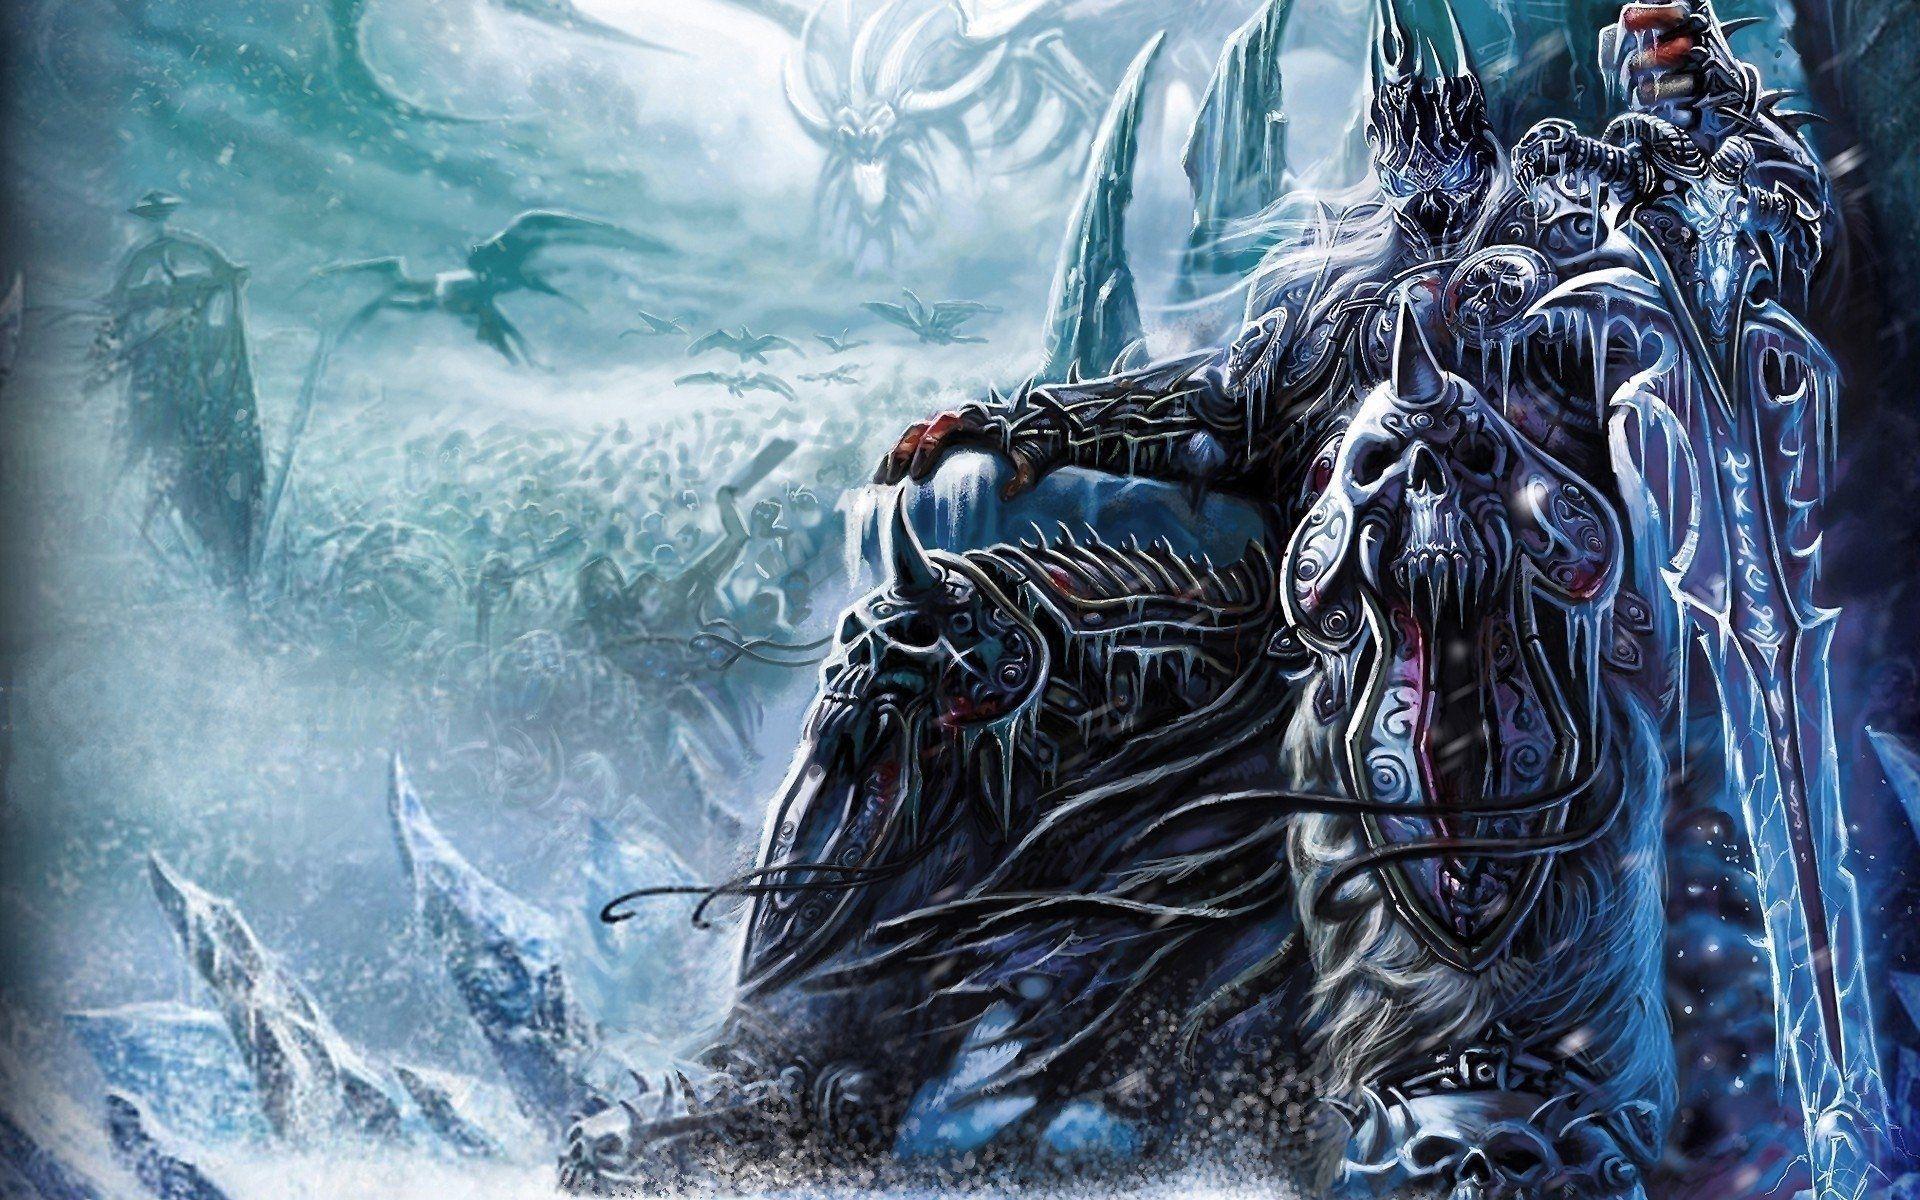 Dark King Wallpapers Top Free Dark King Backgrounds Wallpaperaccess